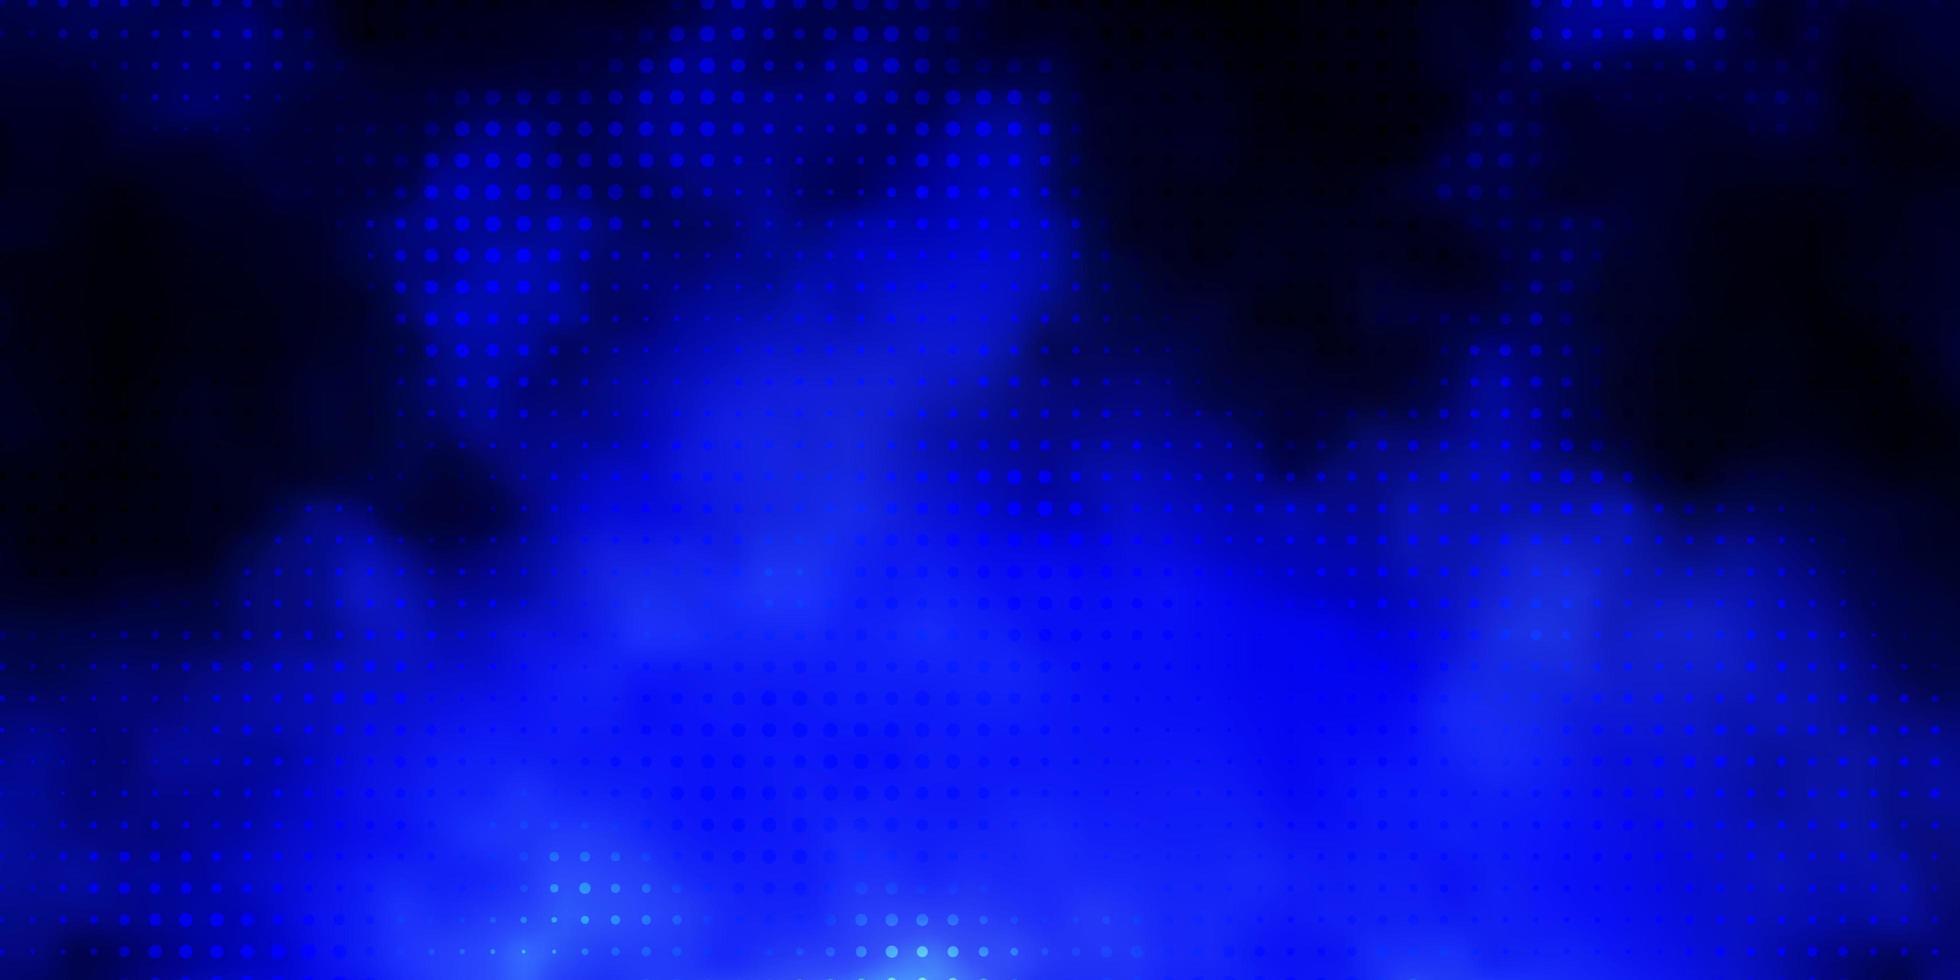 donkerblauwe vectorlay-out met cirkelvormen vector